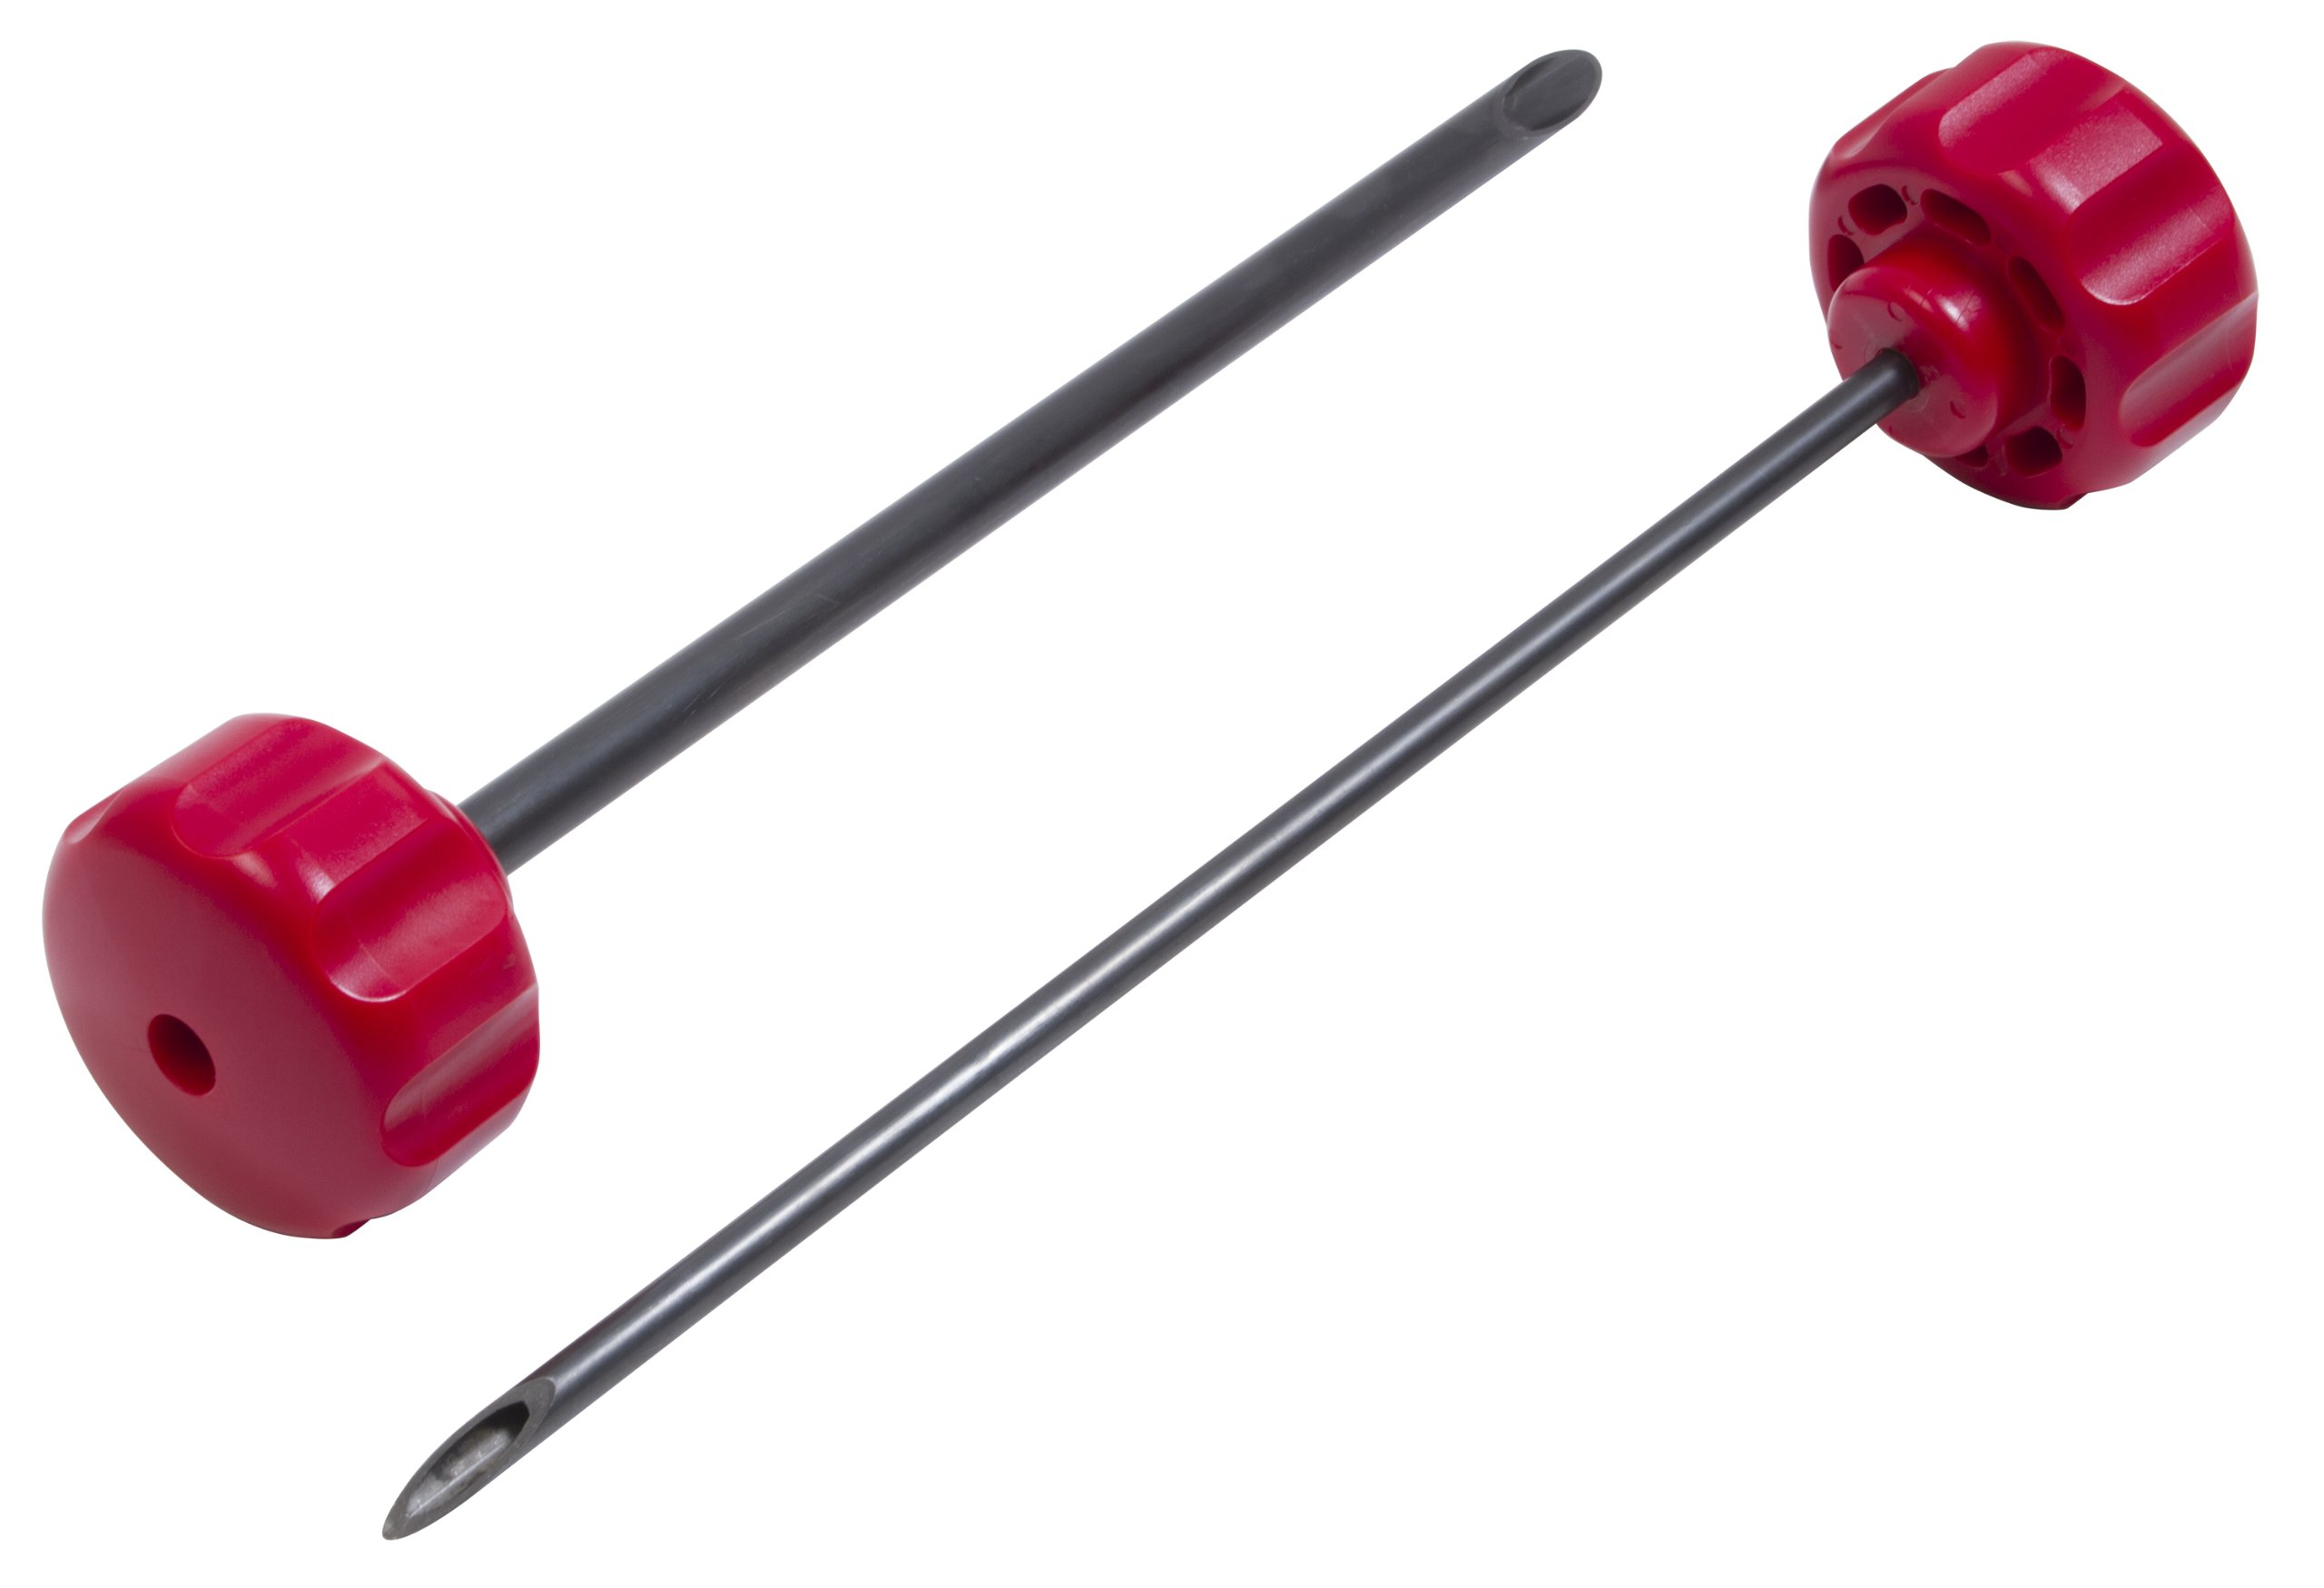 Lisle 61030 2-Piece Wire Inserter Combo Set